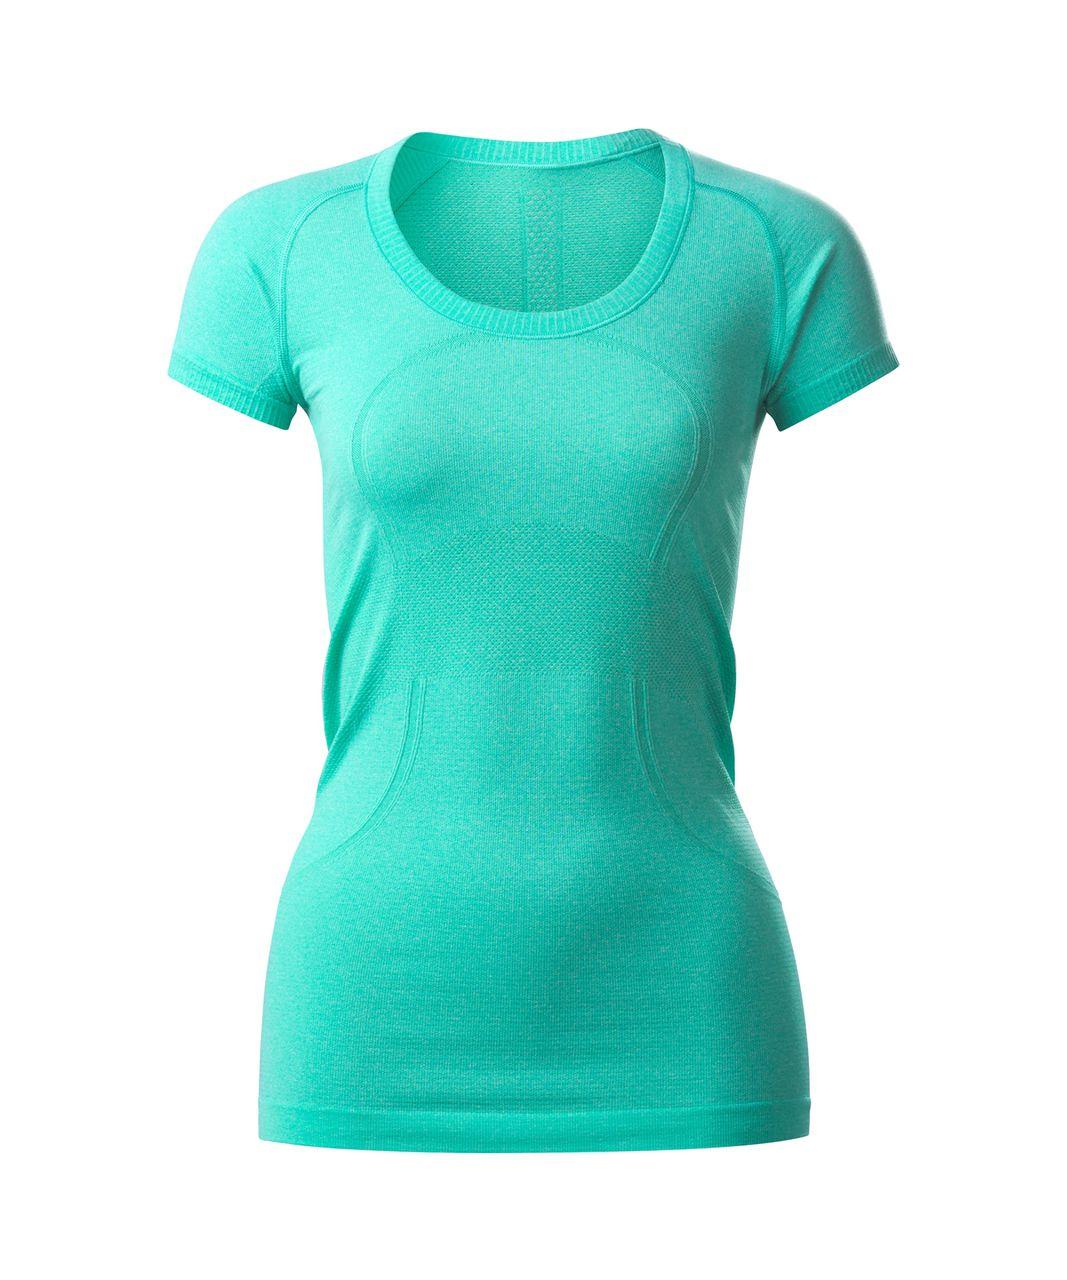 Lululemon Swiftly Tech Short Sleeve Scoop - Heathered Bali Breeze